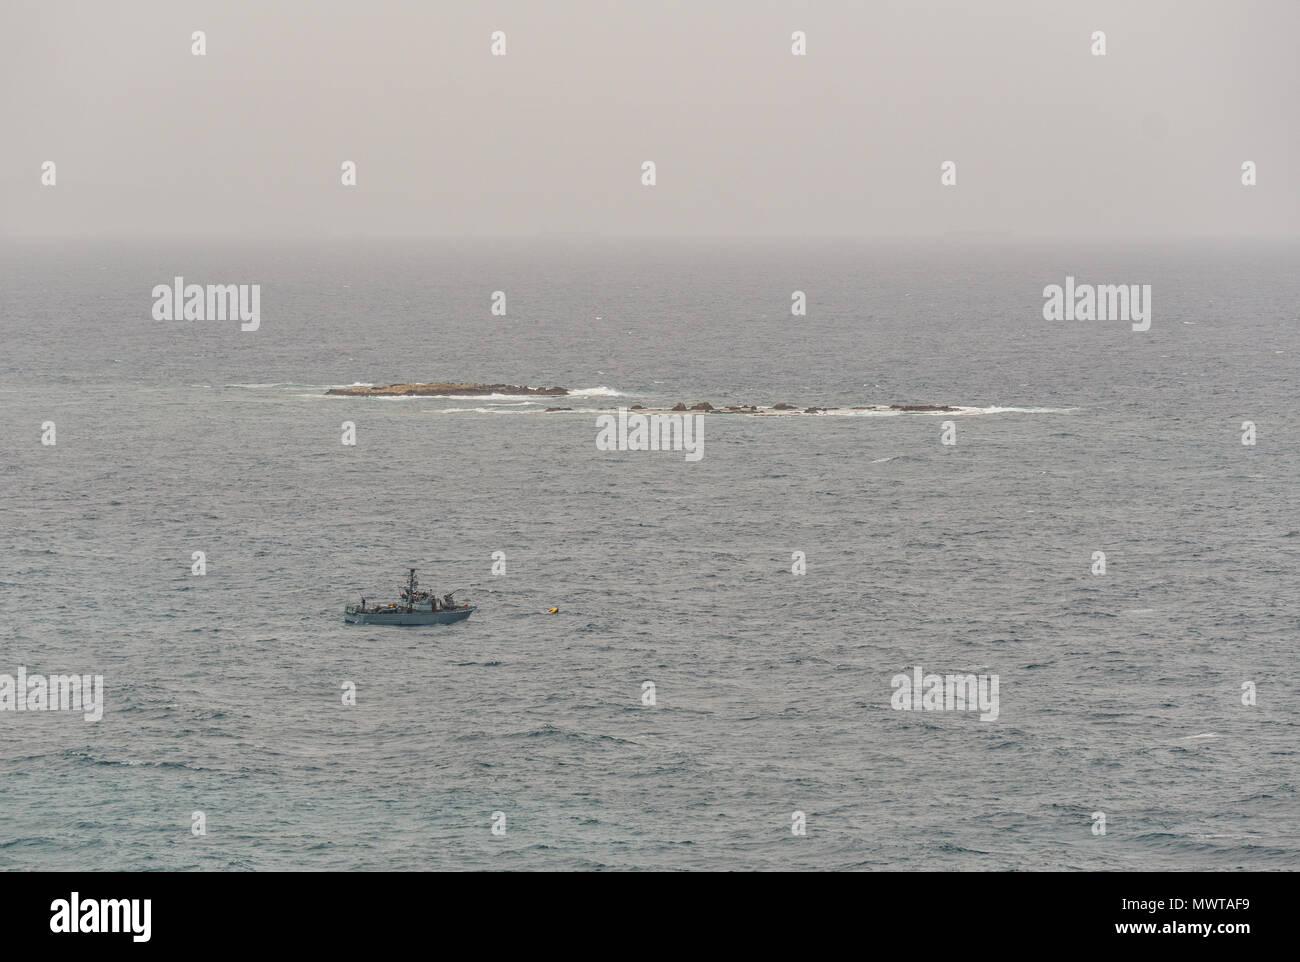 NAHARIYA, ISRAEL-MARCH 24, 2018: Military ship patrols the Israeli border in Mediterranean sea. - Stock Image